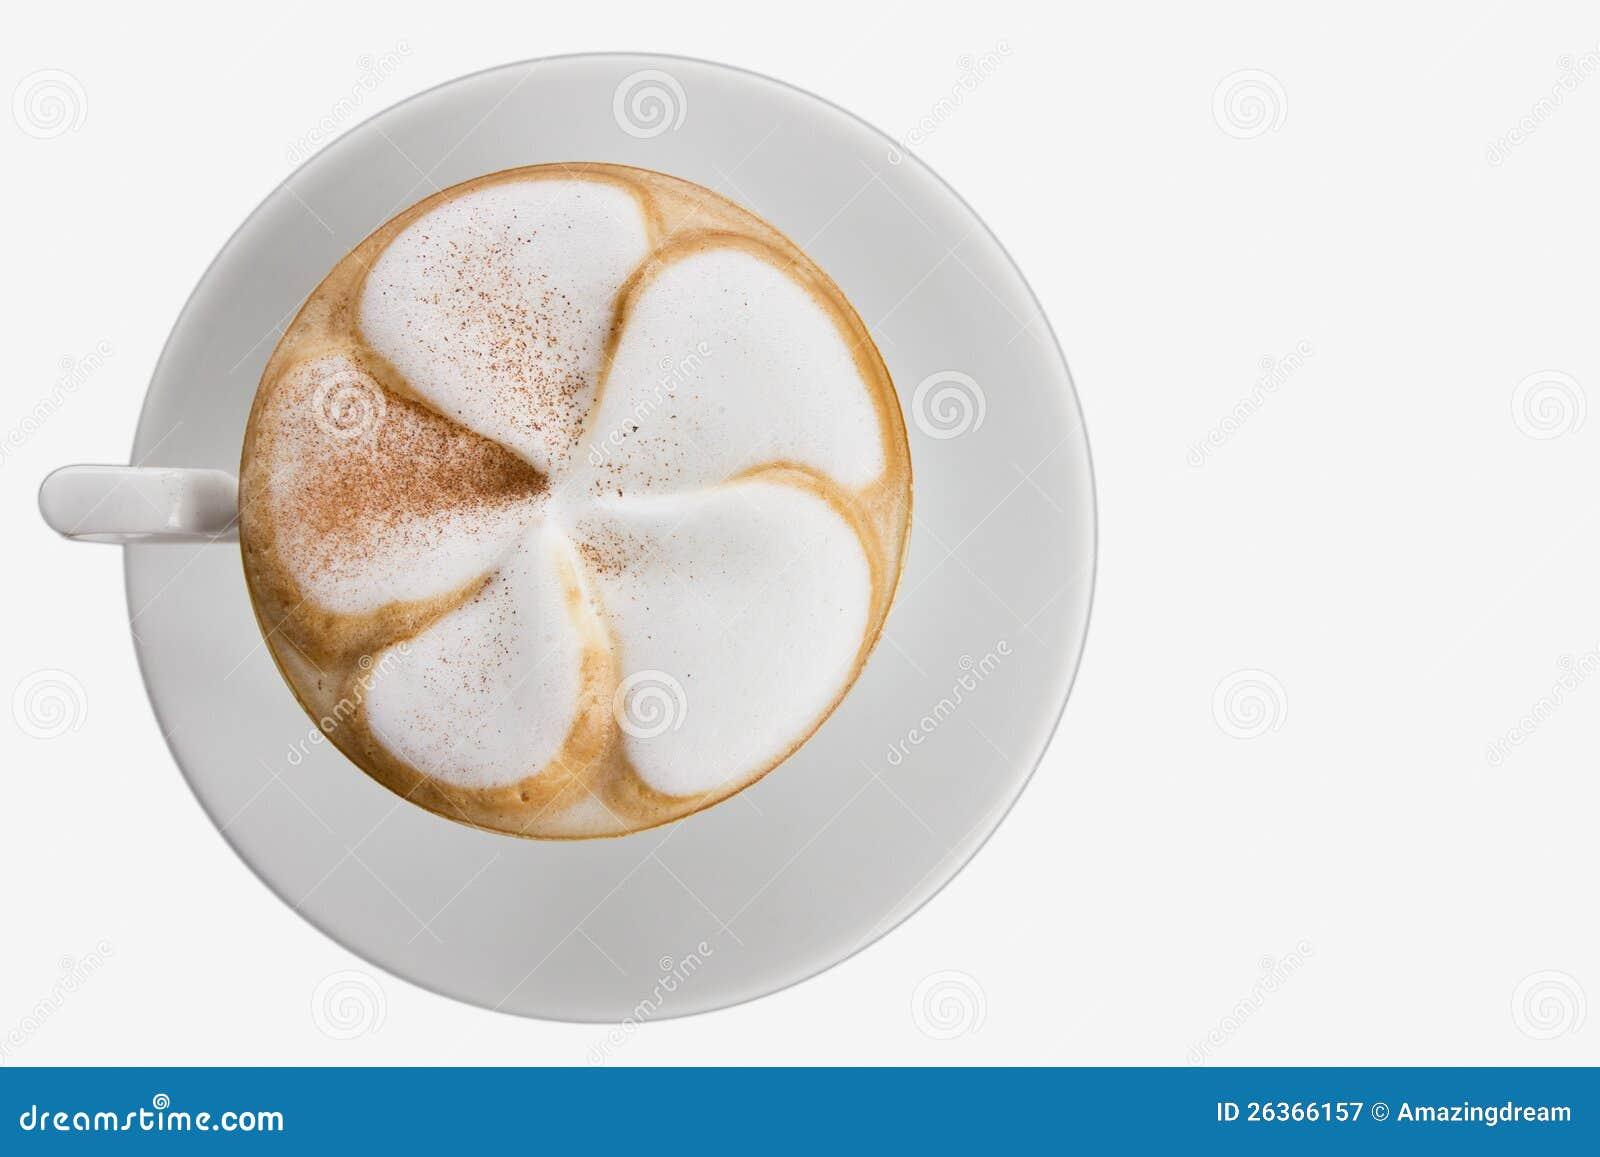 Art Latte isolated on white